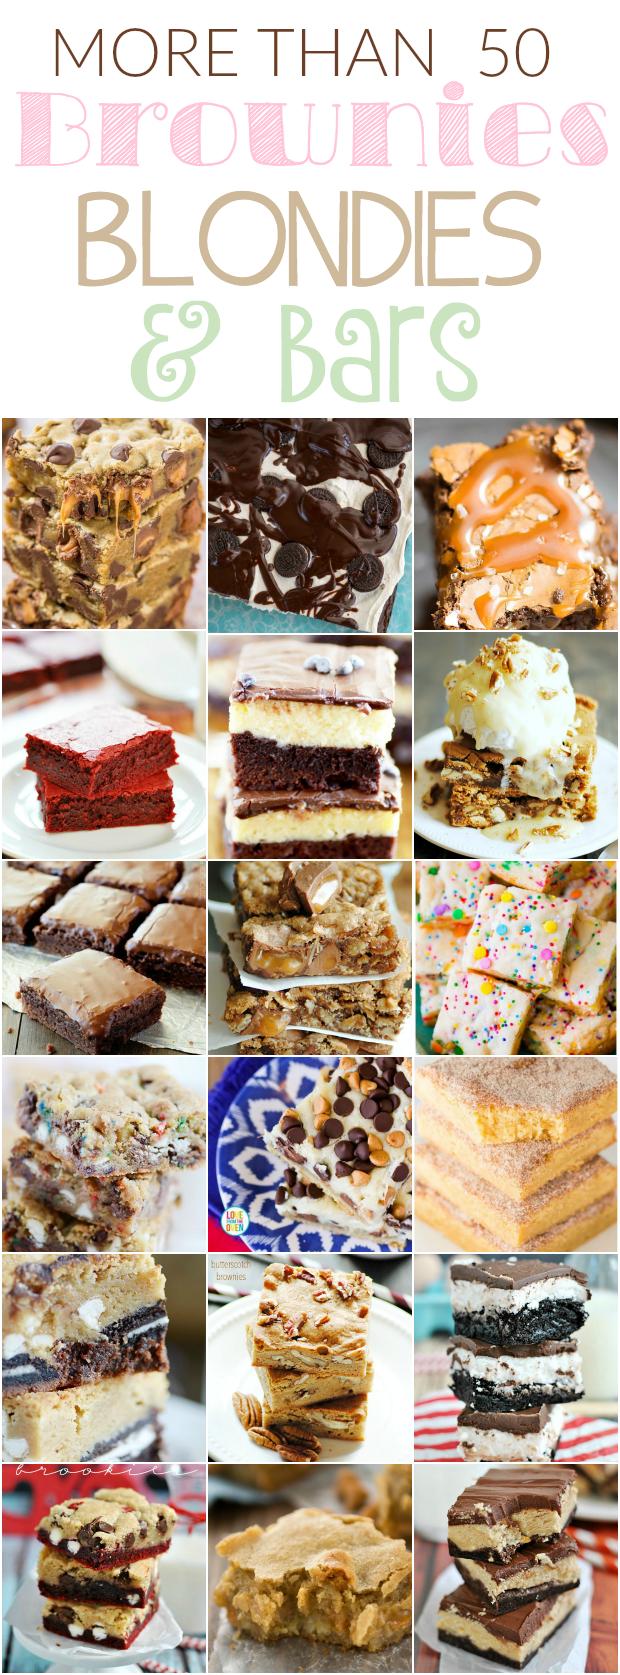 50+ Brownies and Bars Recipes